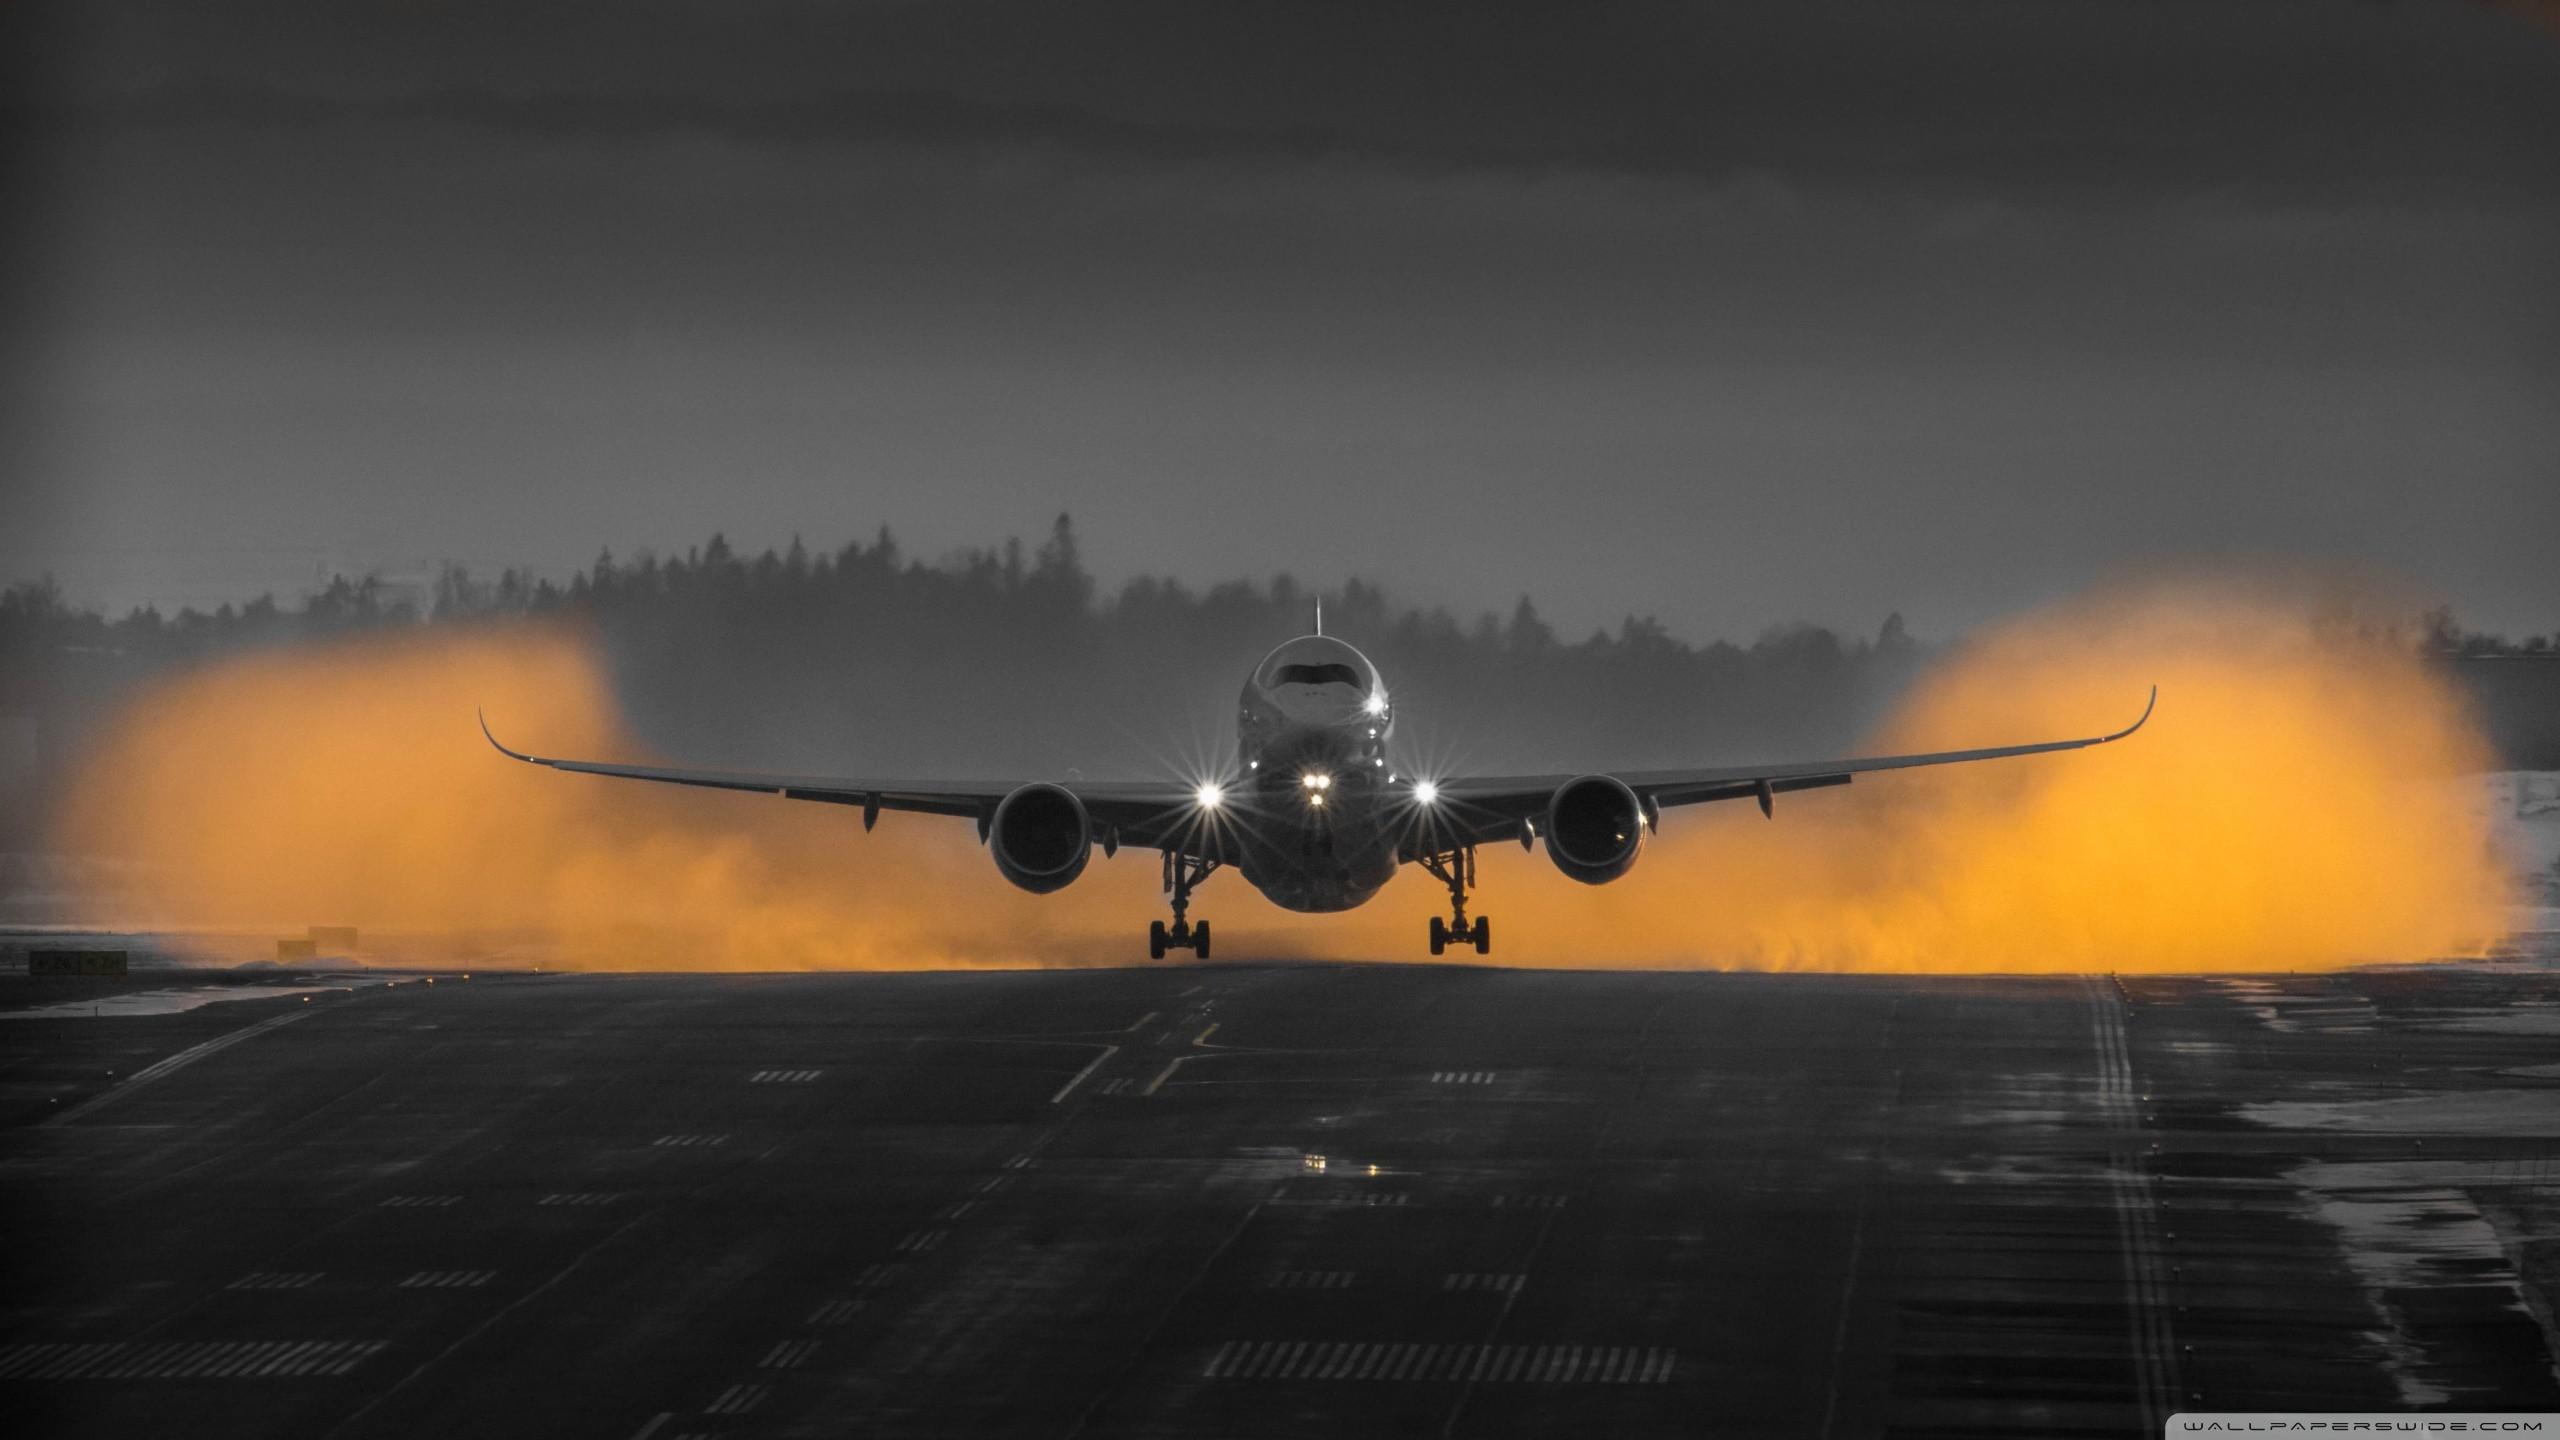 Airplane Wallpaper Iphone 7 Airbus Wallpaper 183 ①